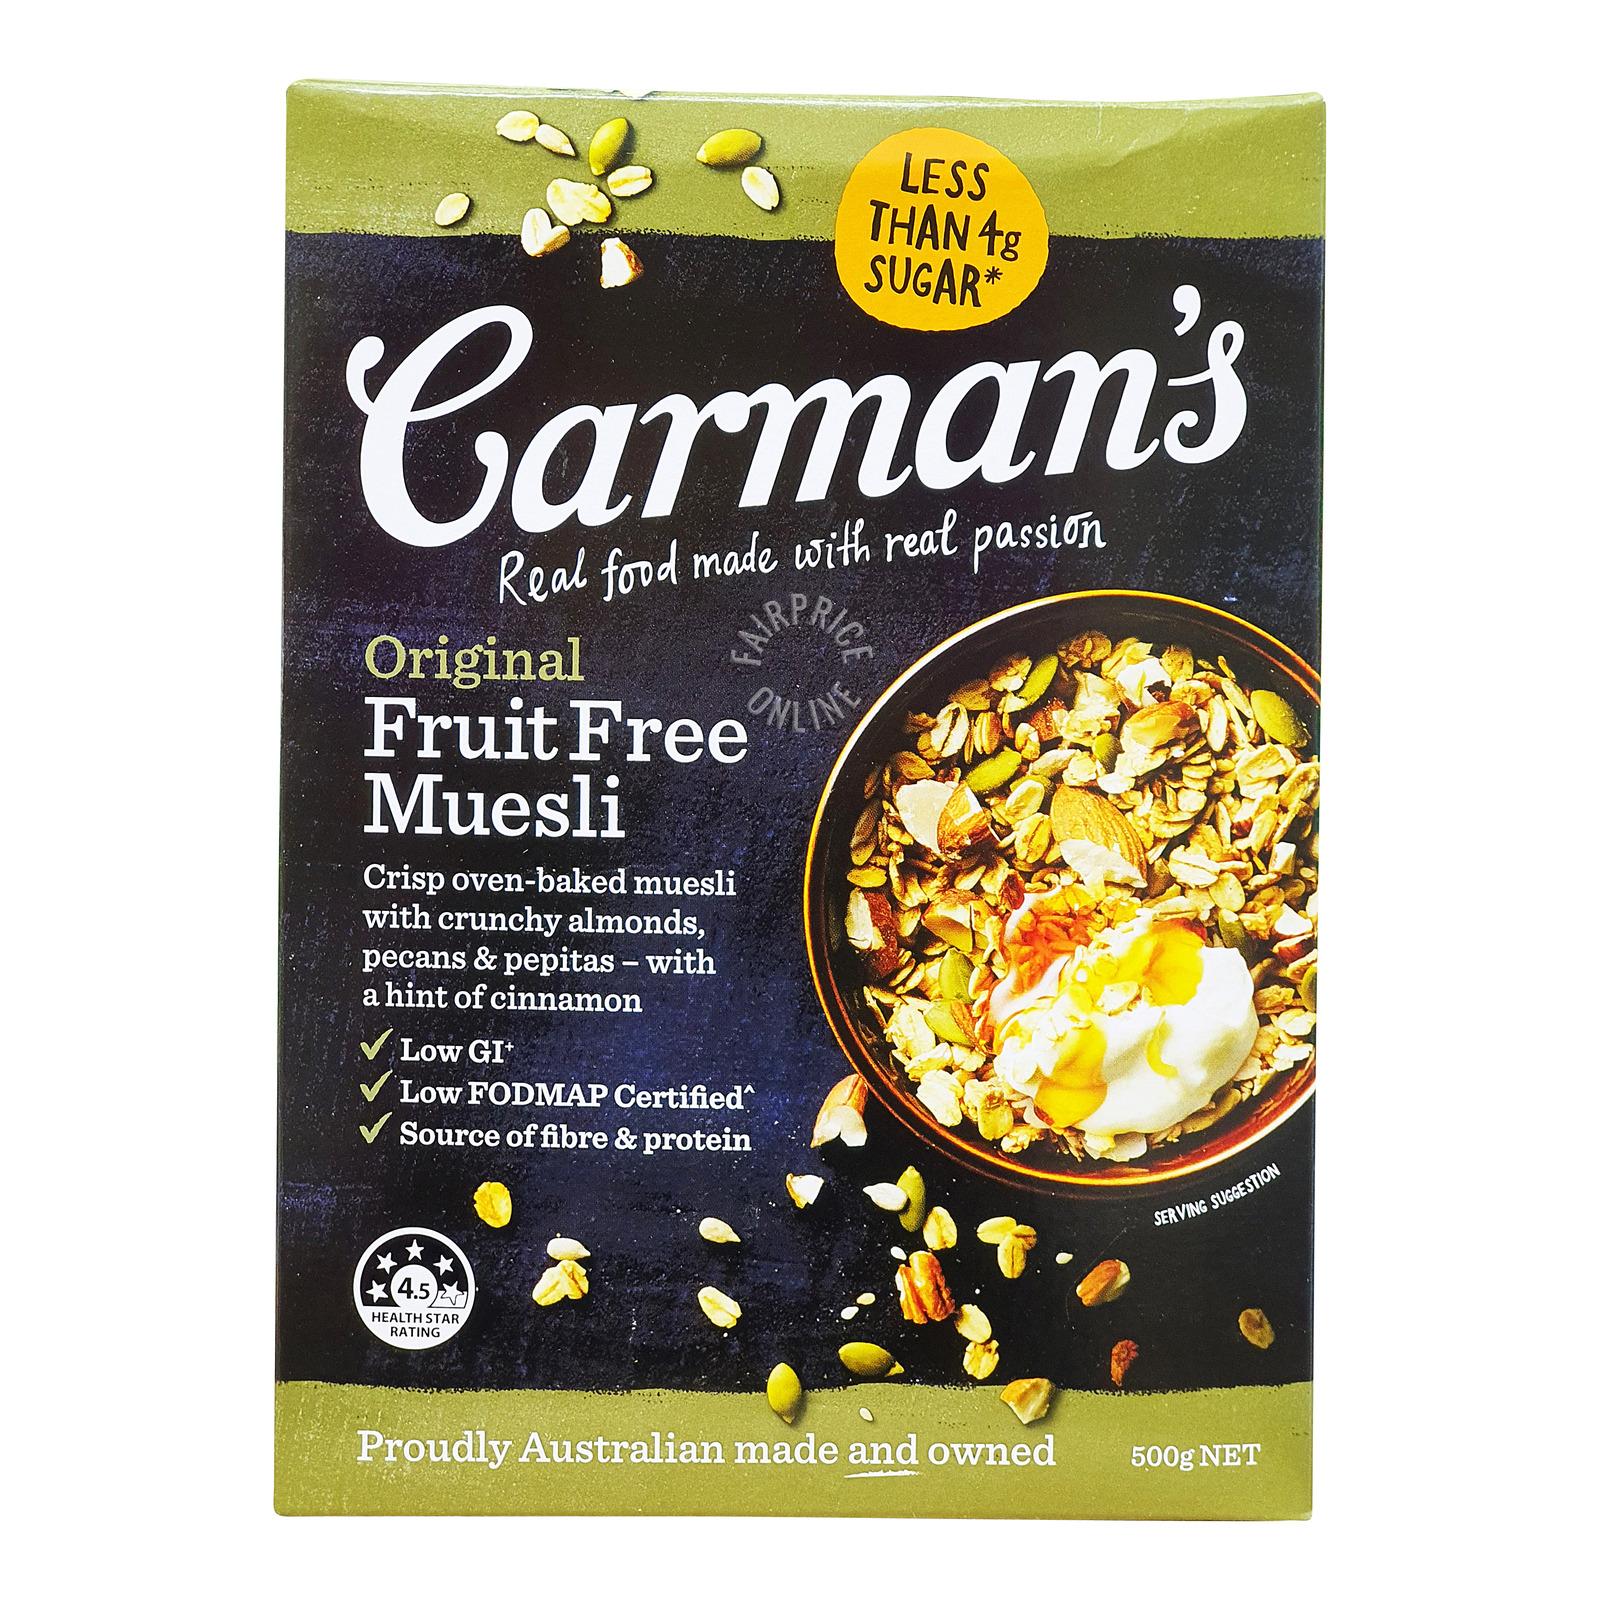 Carman's Muesli - Original (Fruit Free)